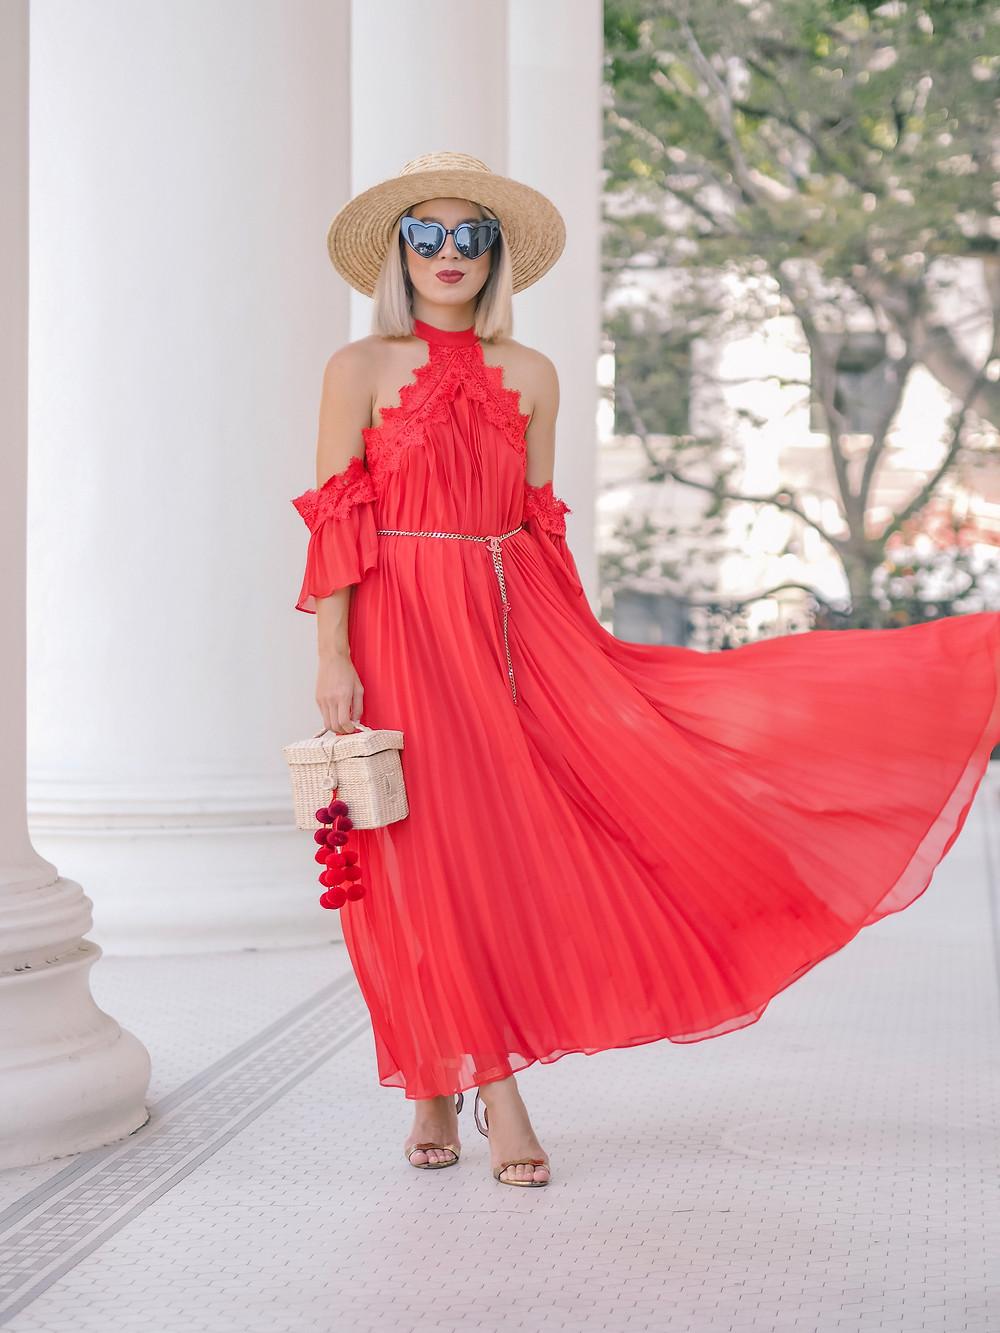 Glamorous Dress   Lam in Louboutins